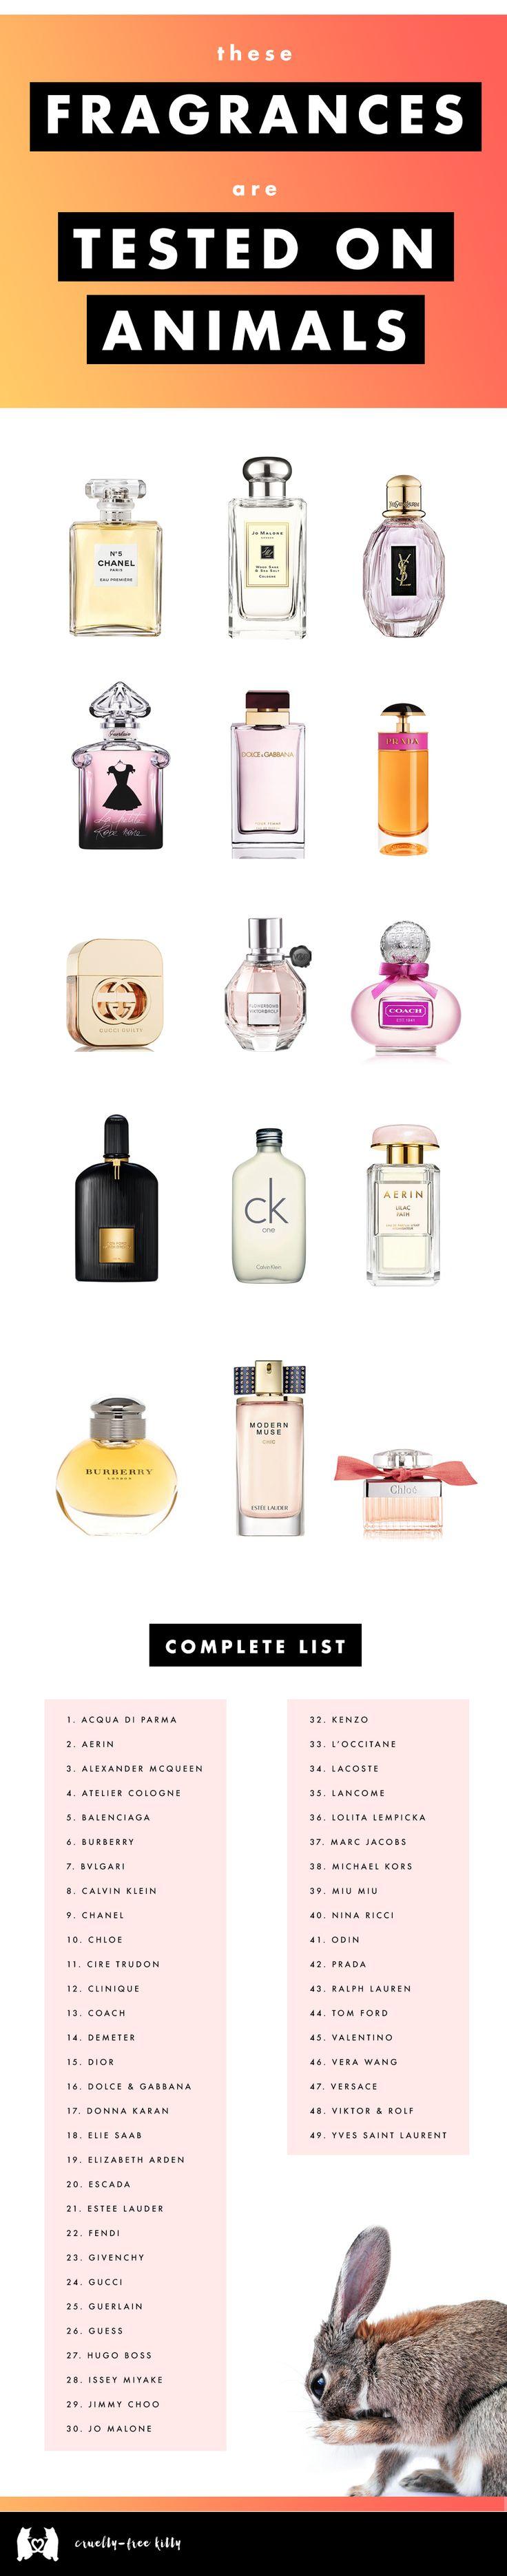 CrueltyFree Perfume Guide Fragrance Companies That Do